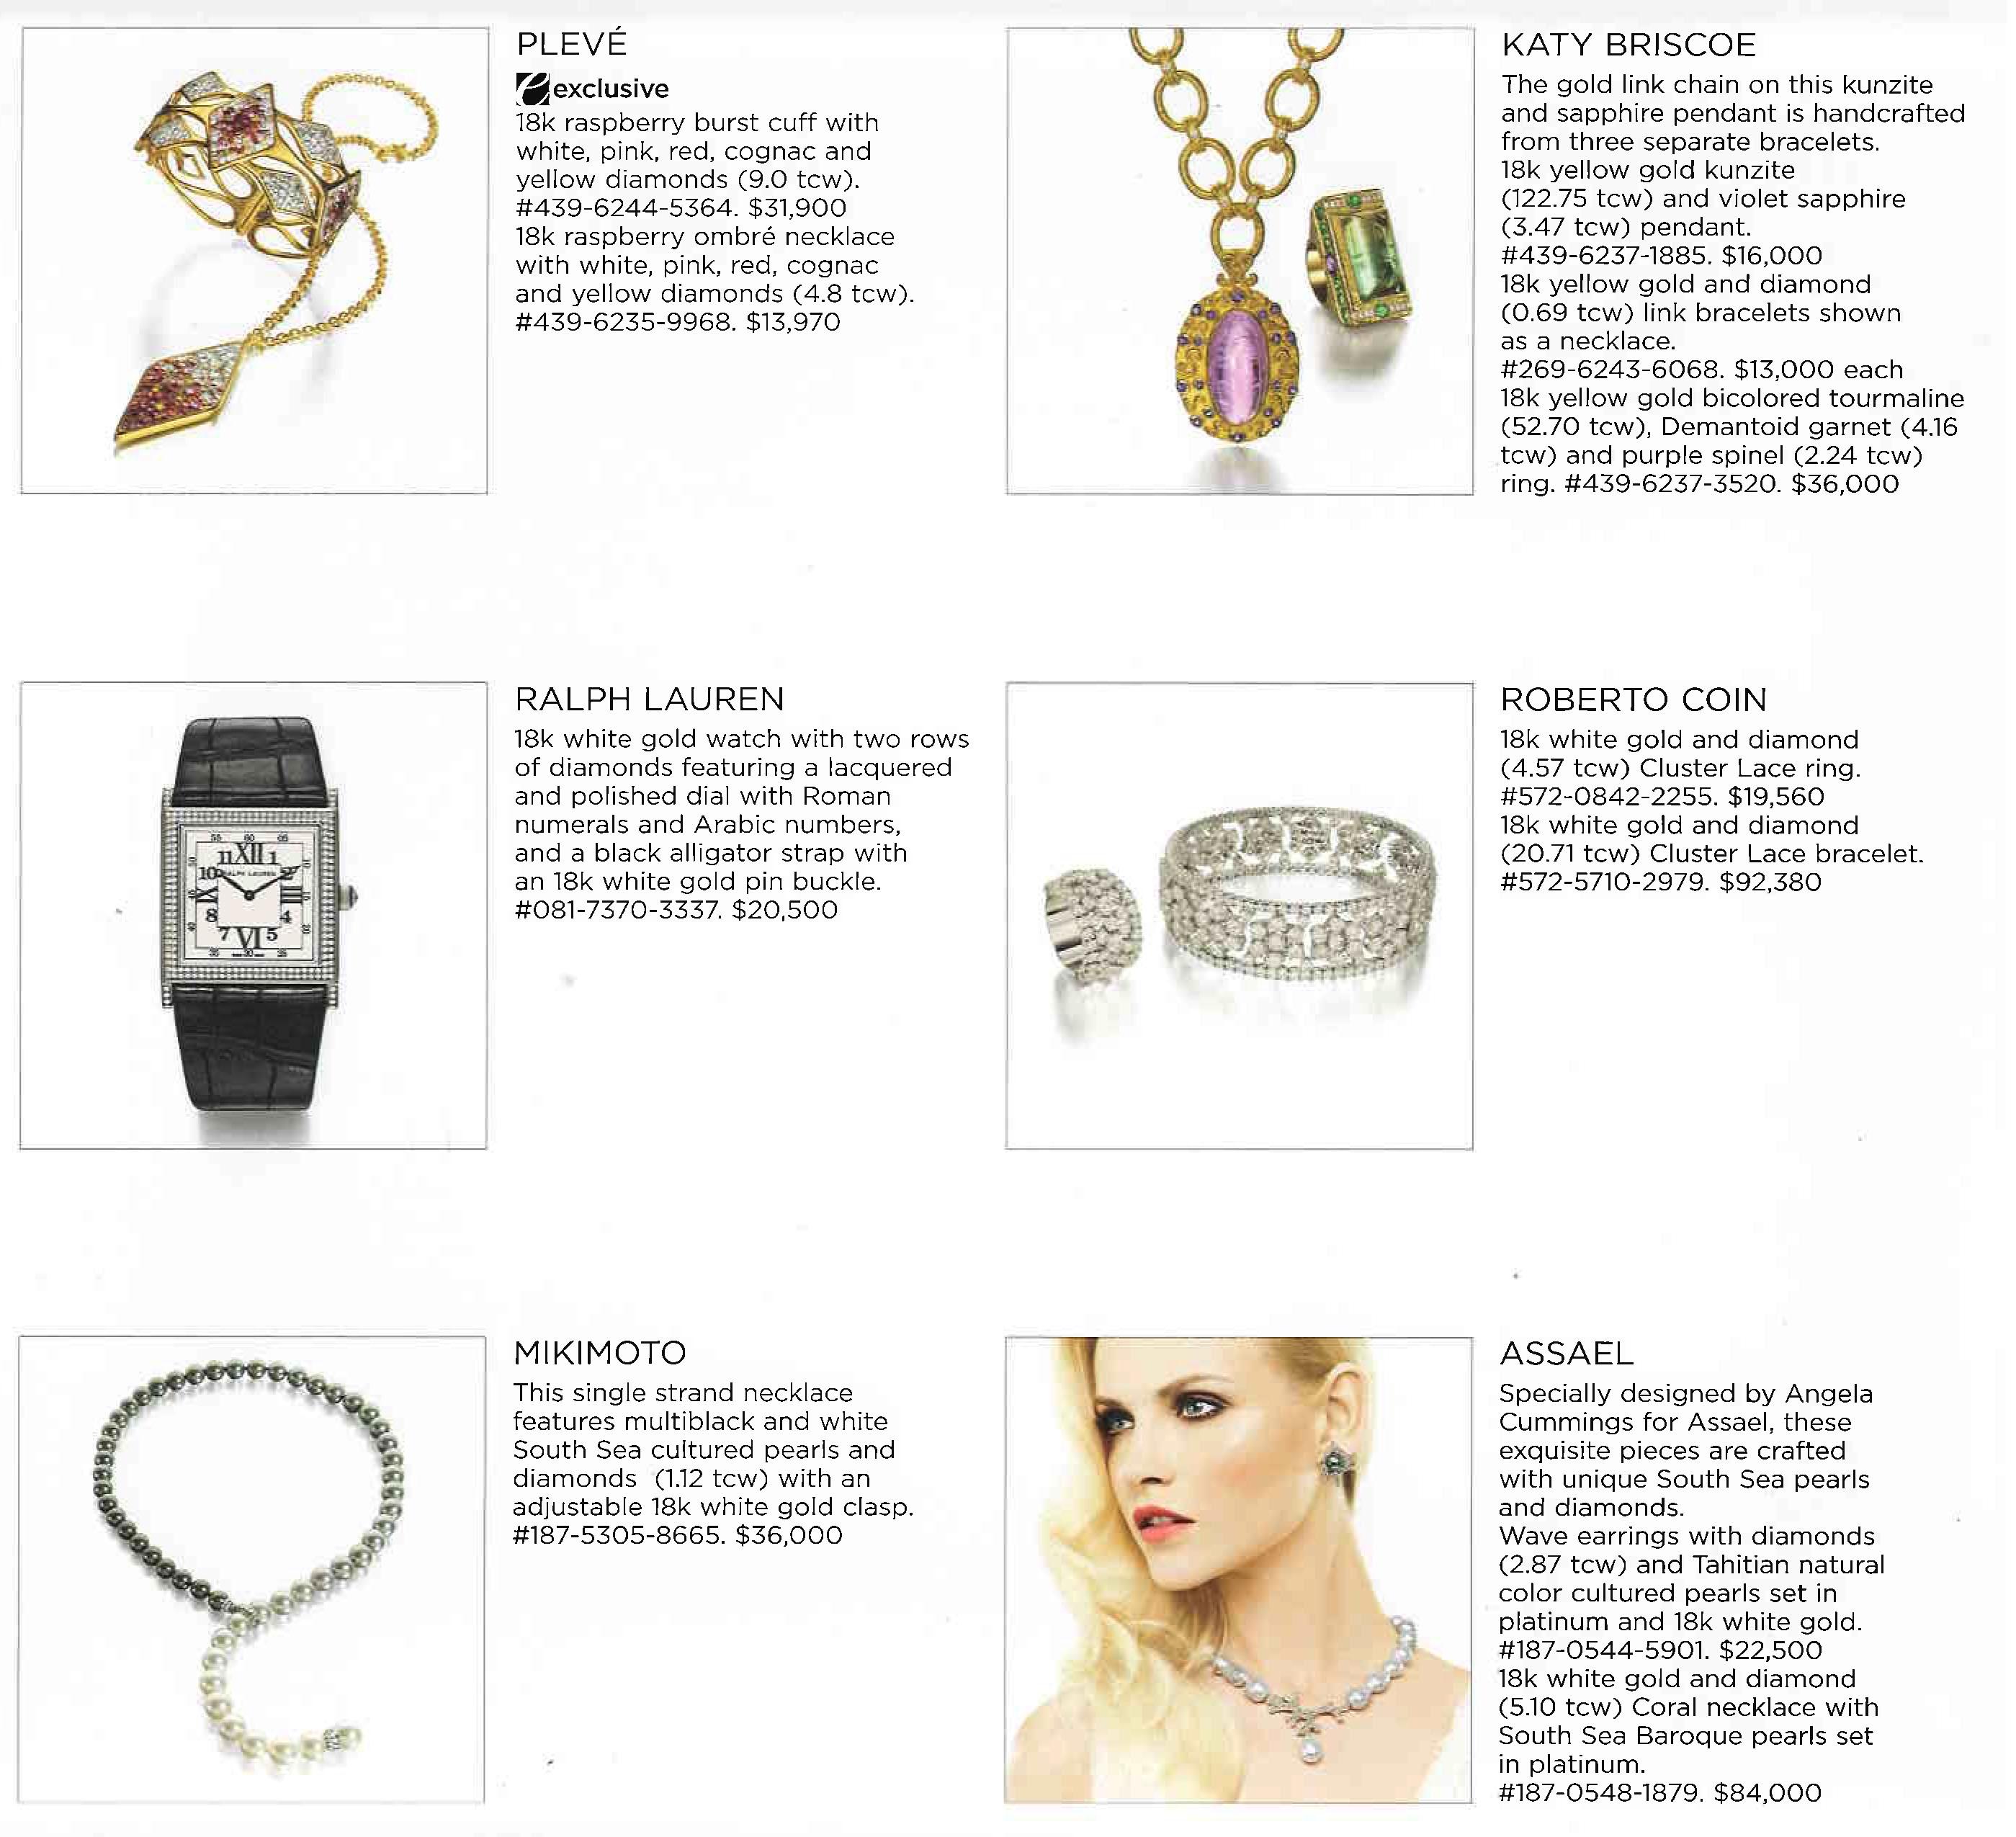 saks jewelry catalog press katy briscoe fine jewelry and home